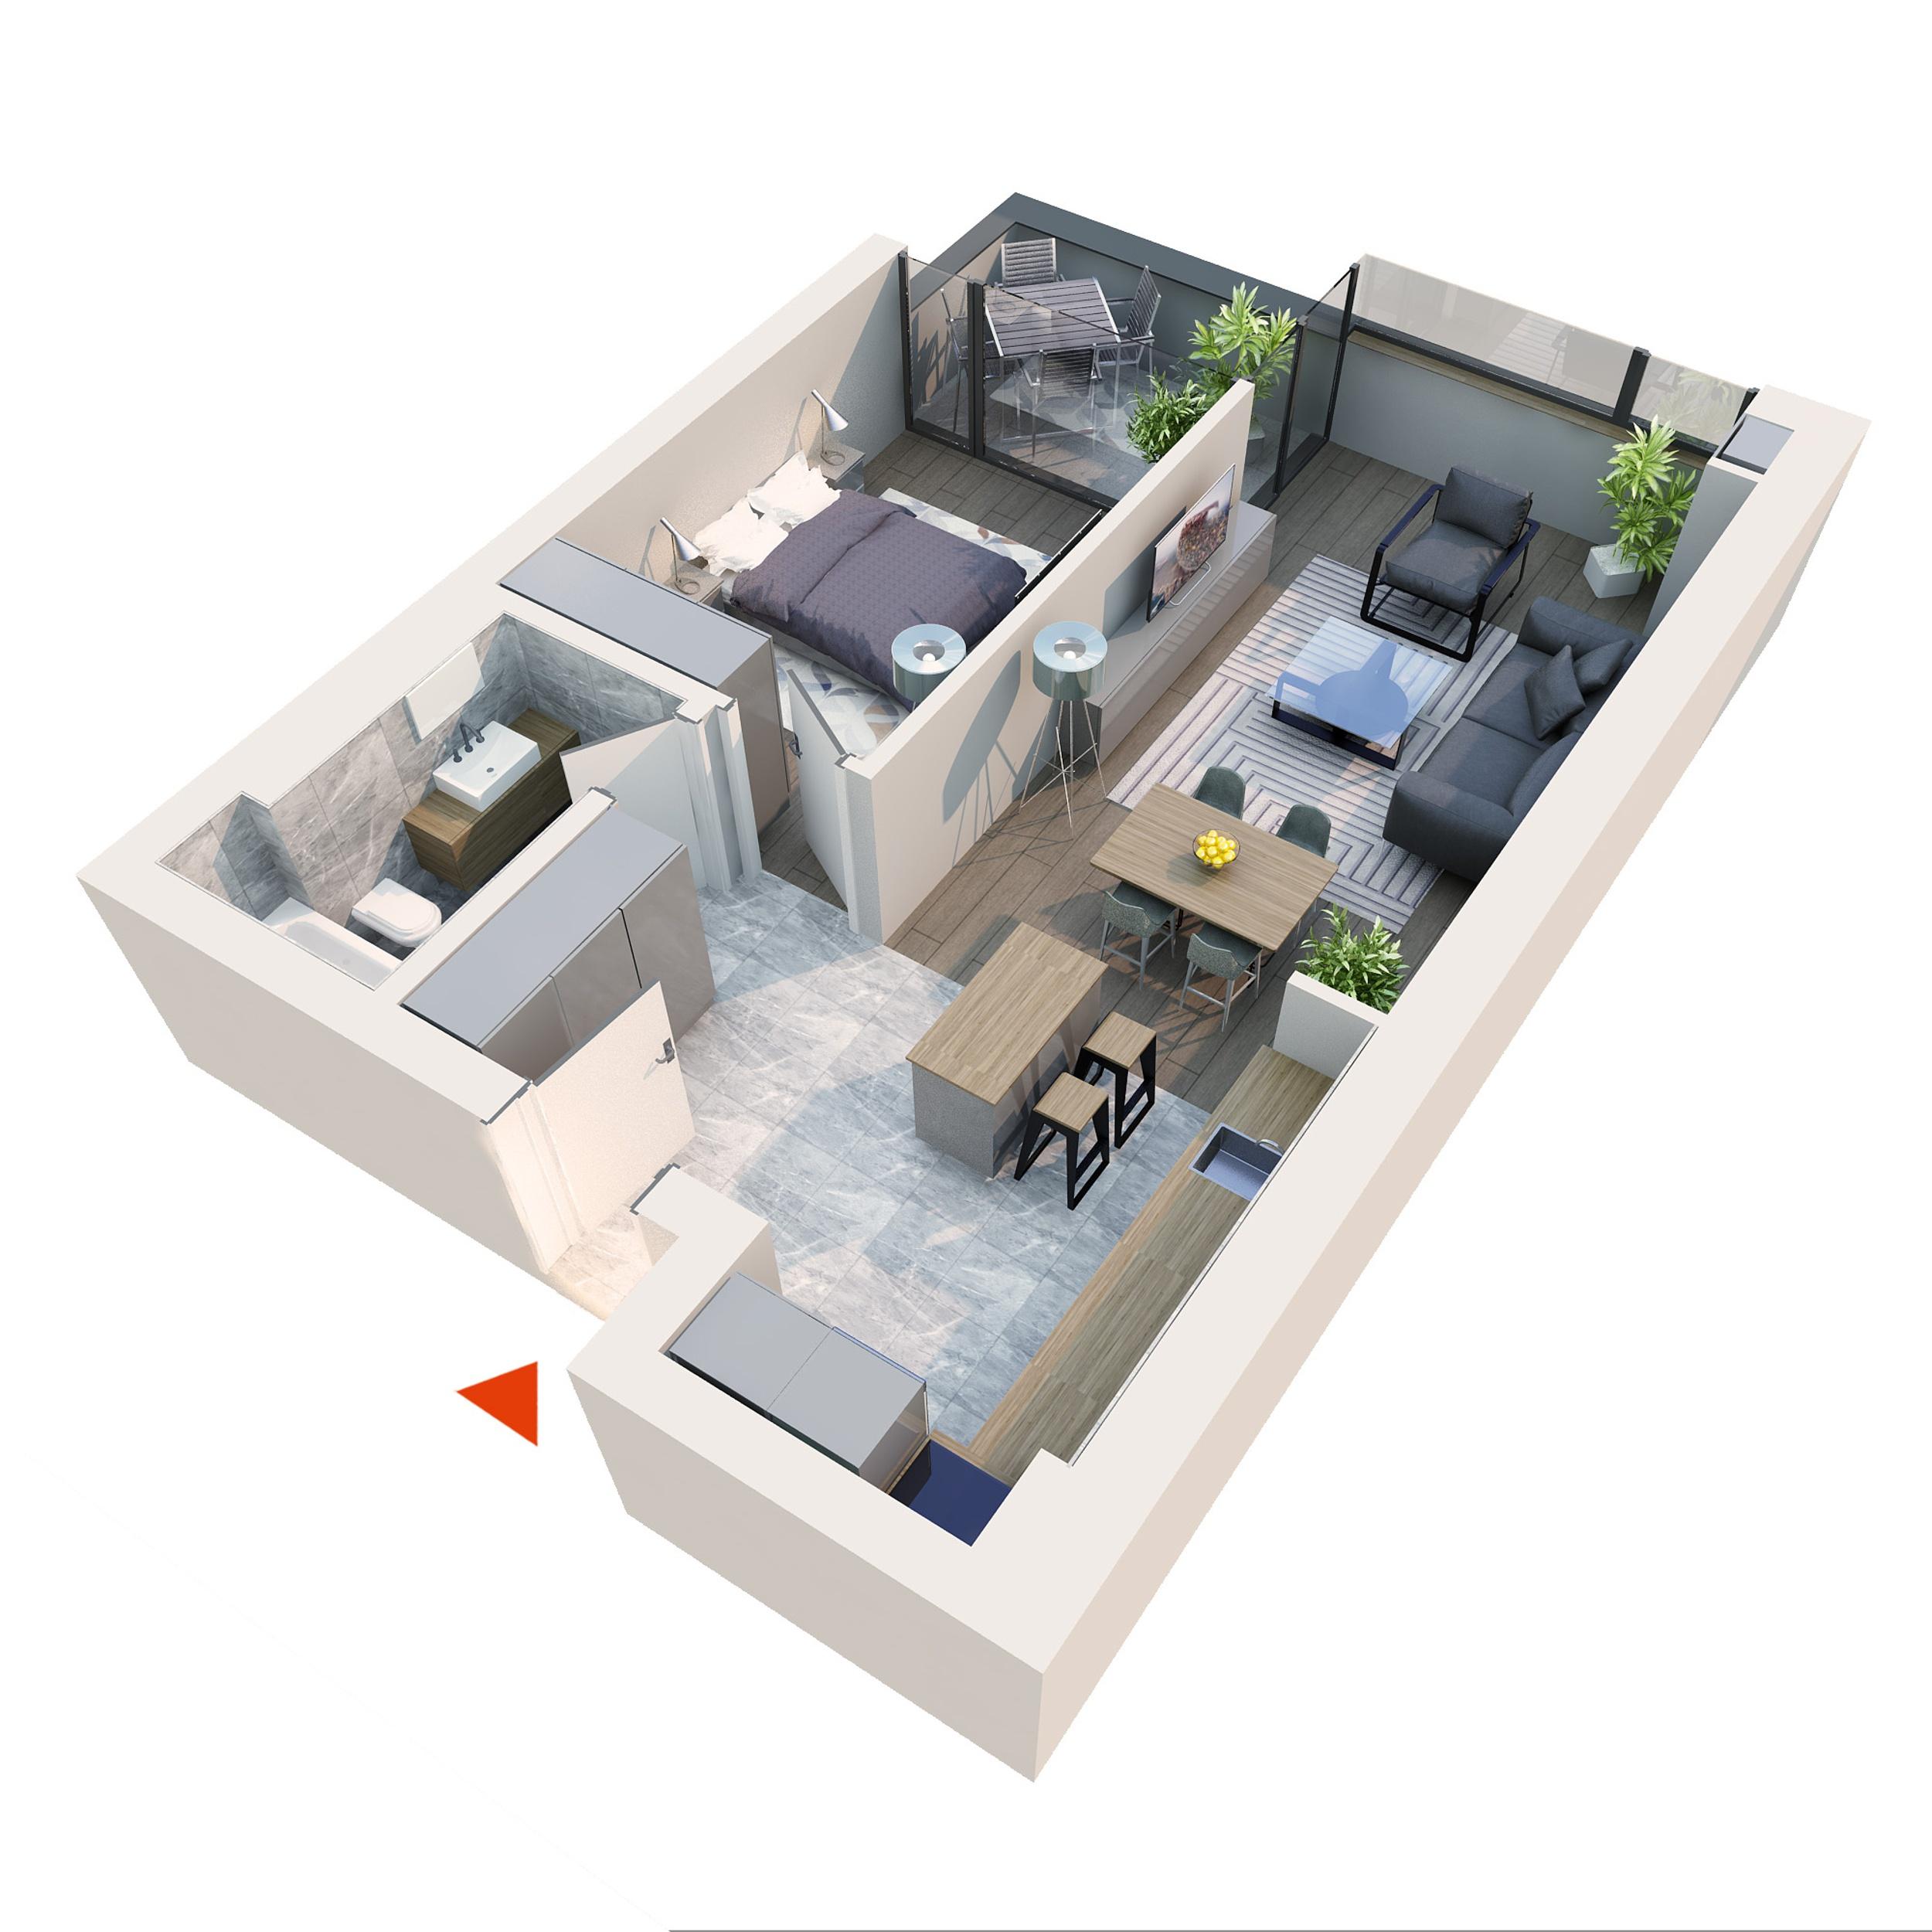 Apartament 2 camere tip 2D2 B12 Logie | Etaj 1-5 | Corp C7 | Faza 2